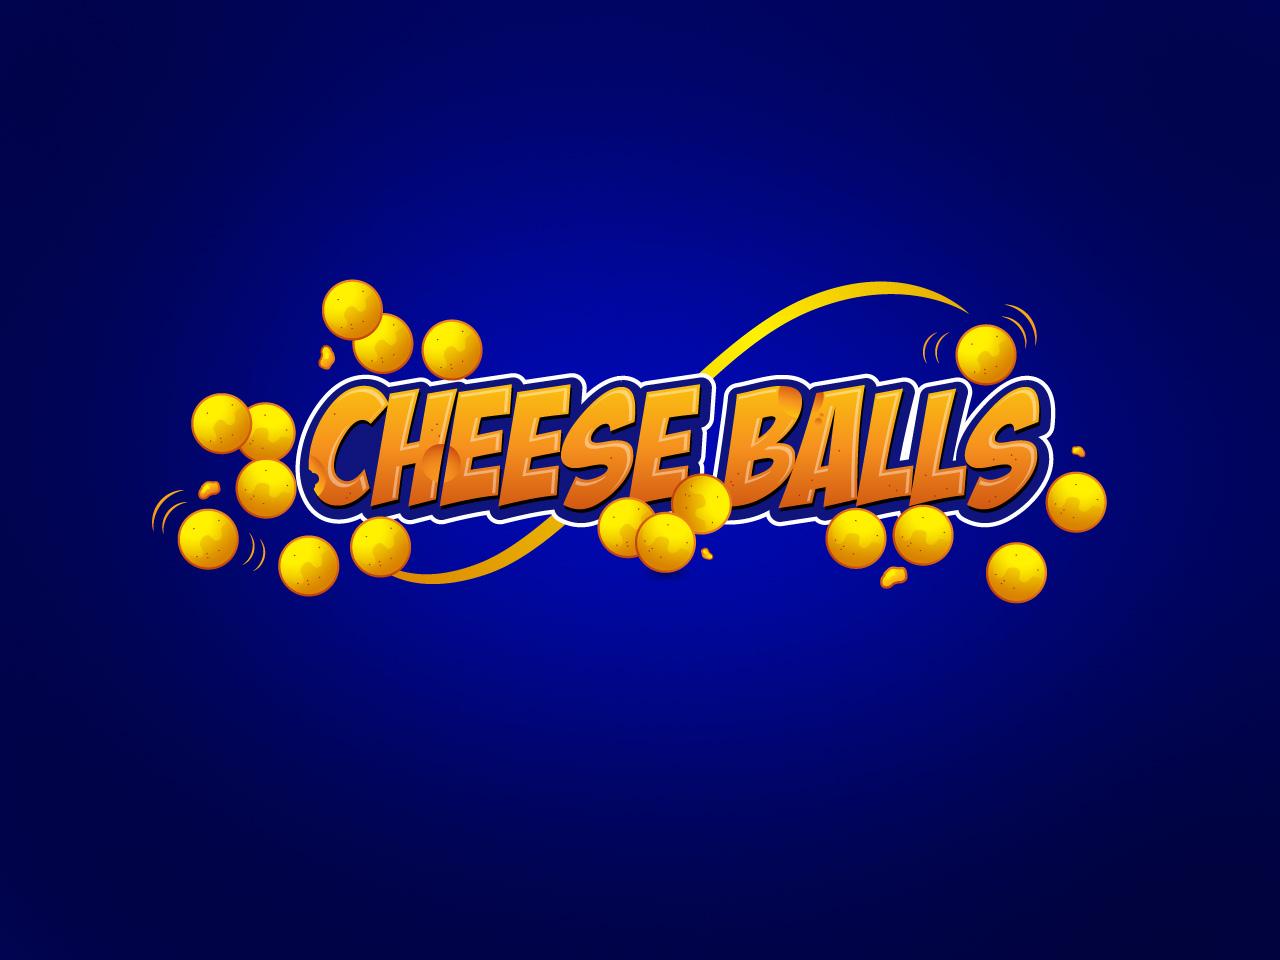 Logo Design by jpbituin - Entry No. 49 in the Logo Design Contest Imaginative Logo Design for Cheese Balls.